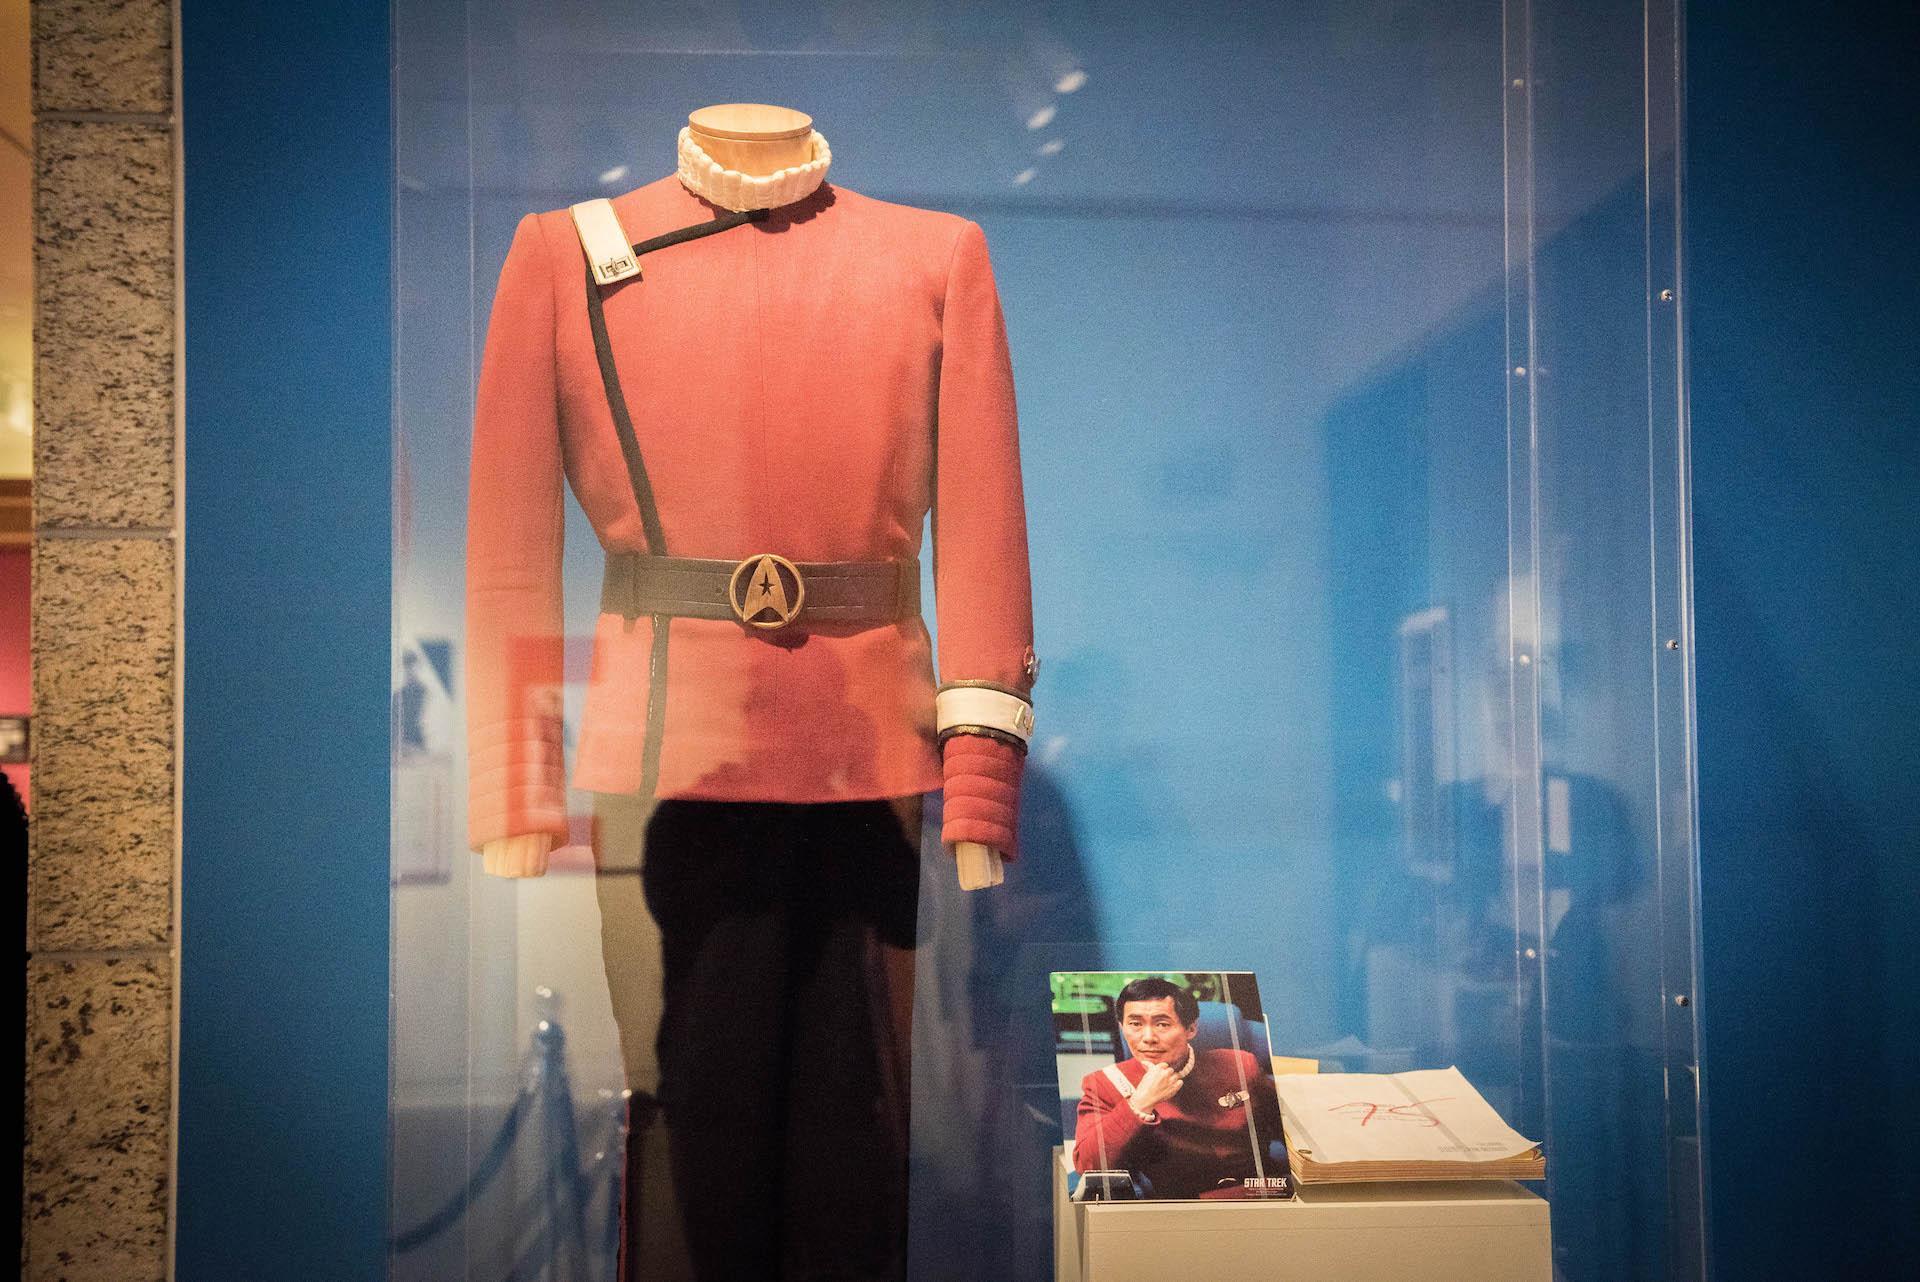 The exhibit includes  Star Trek memorabilia like Sulu's outfit.